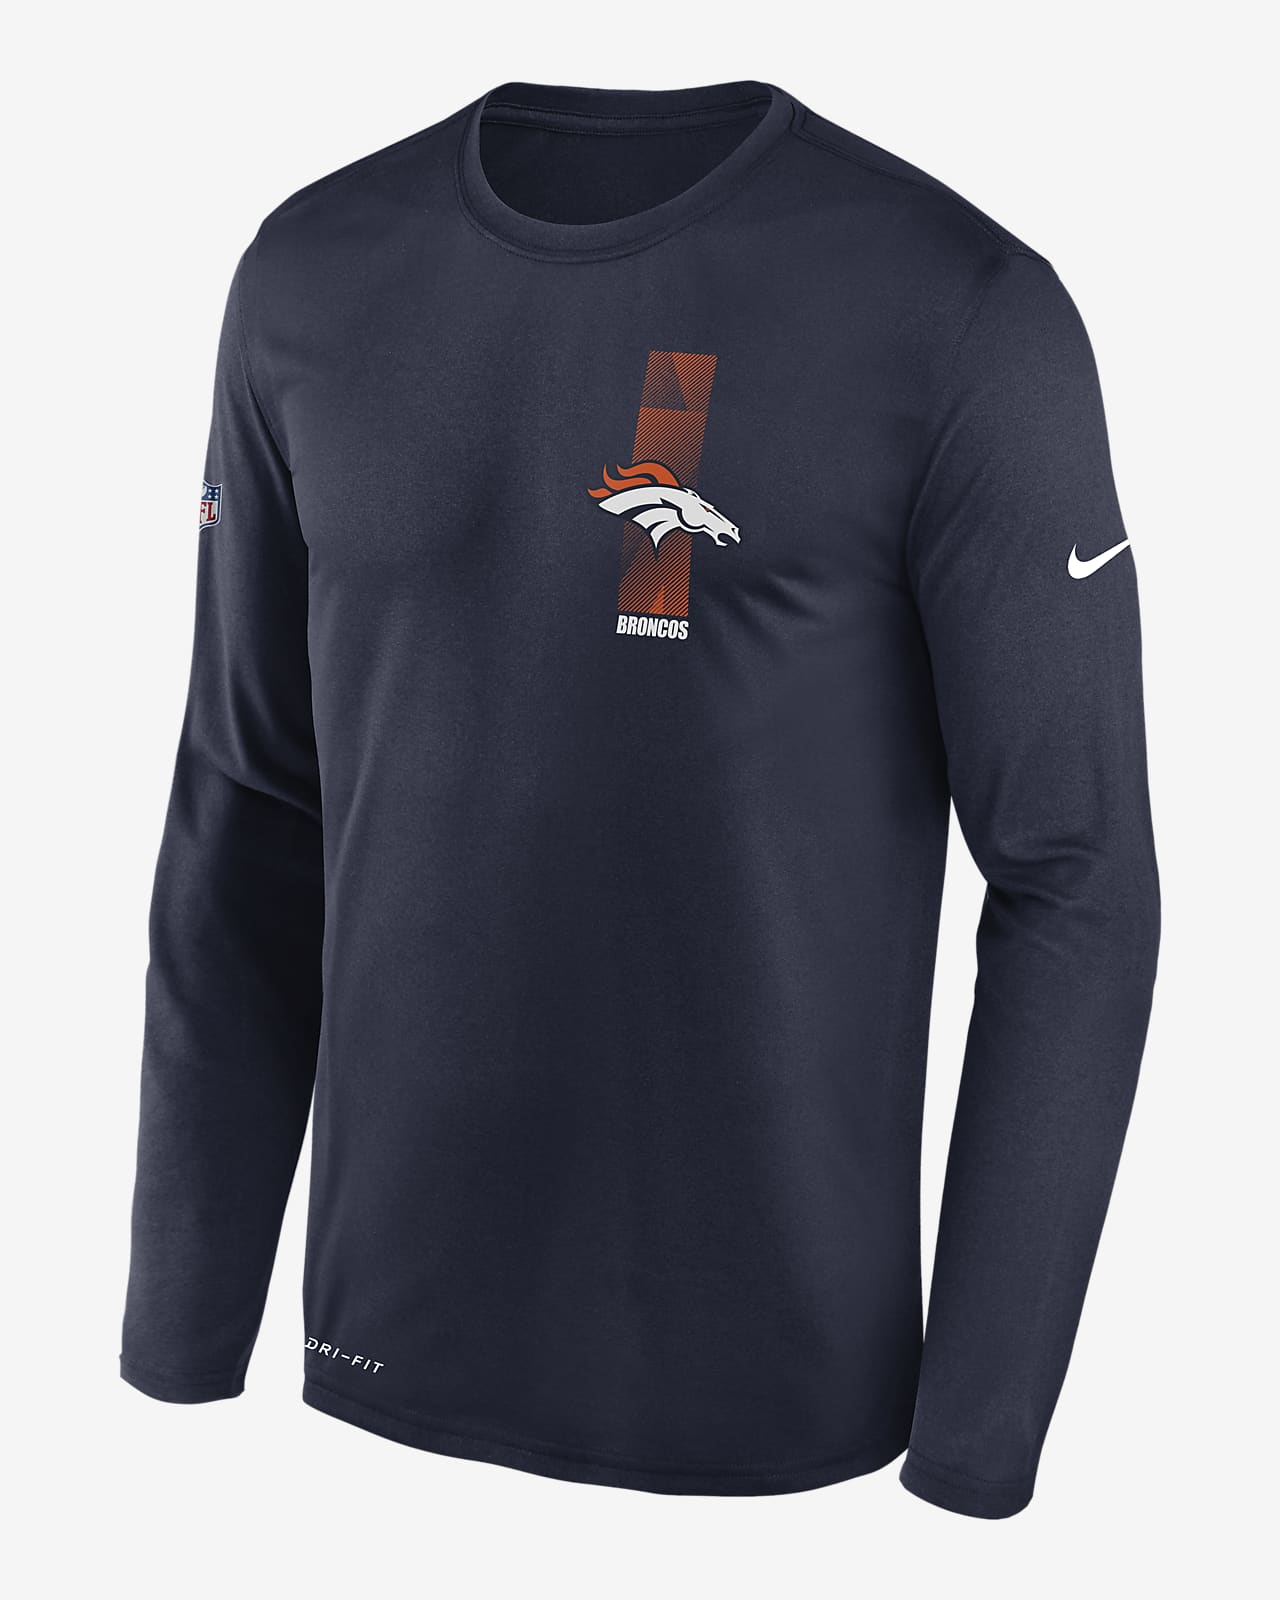 Nike Legend (NFL Broncos) Men's Long-Sleeve T-Shirt